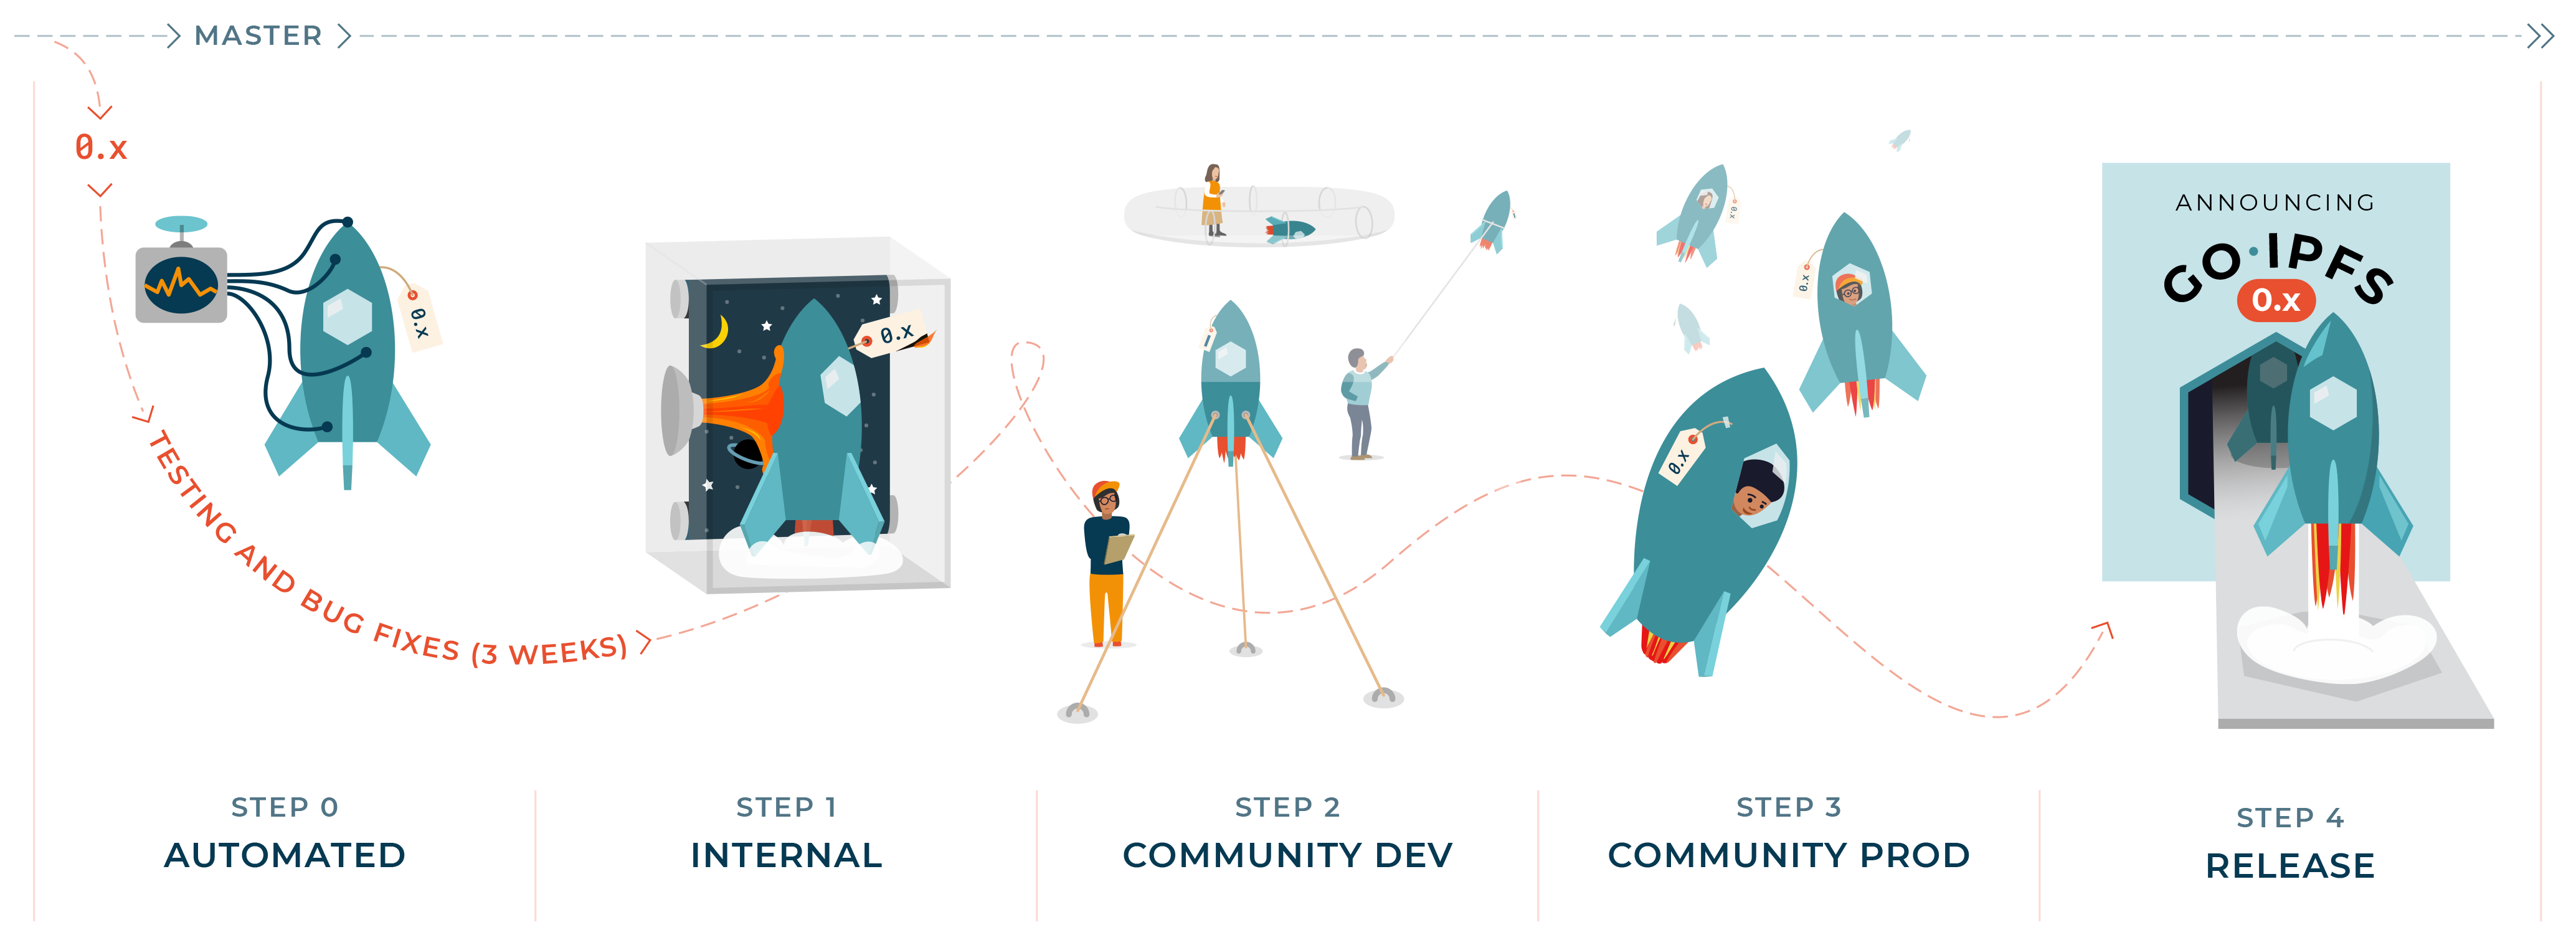 go-ipfs-release-process-illustration